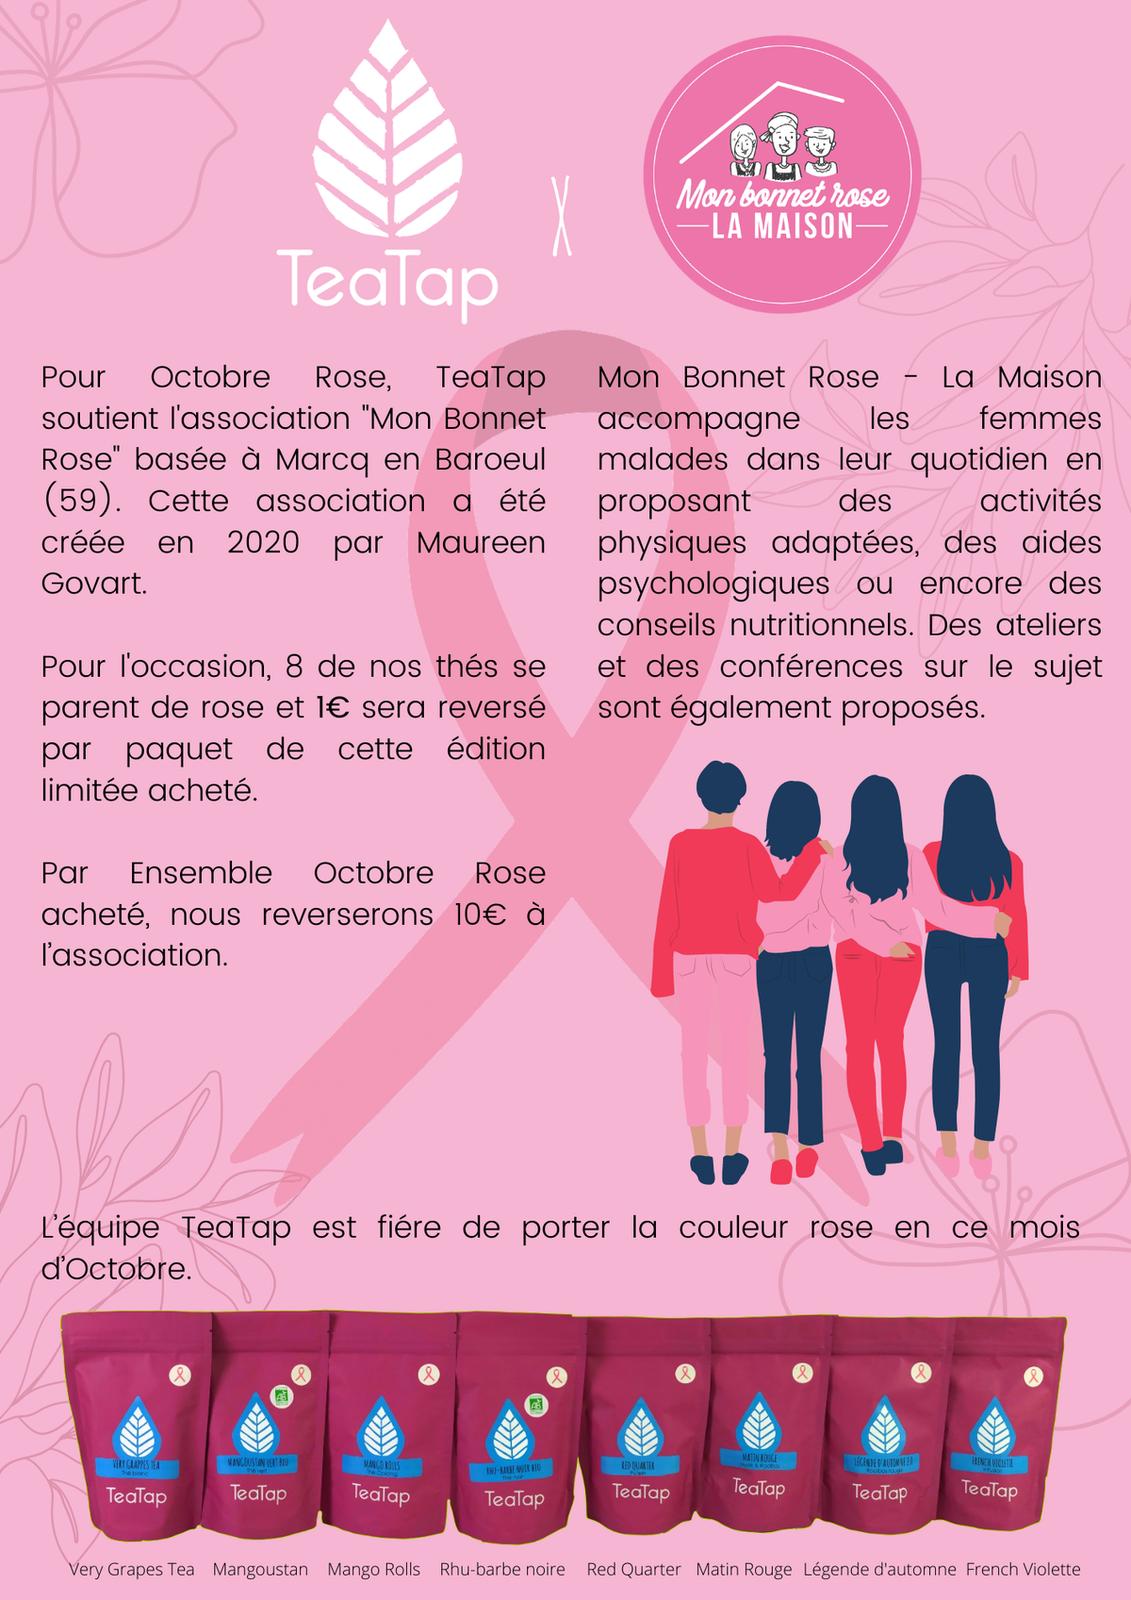 octobre rose mon bonnet rose teatap action caritative france initiative cancer su sein thé tisanes